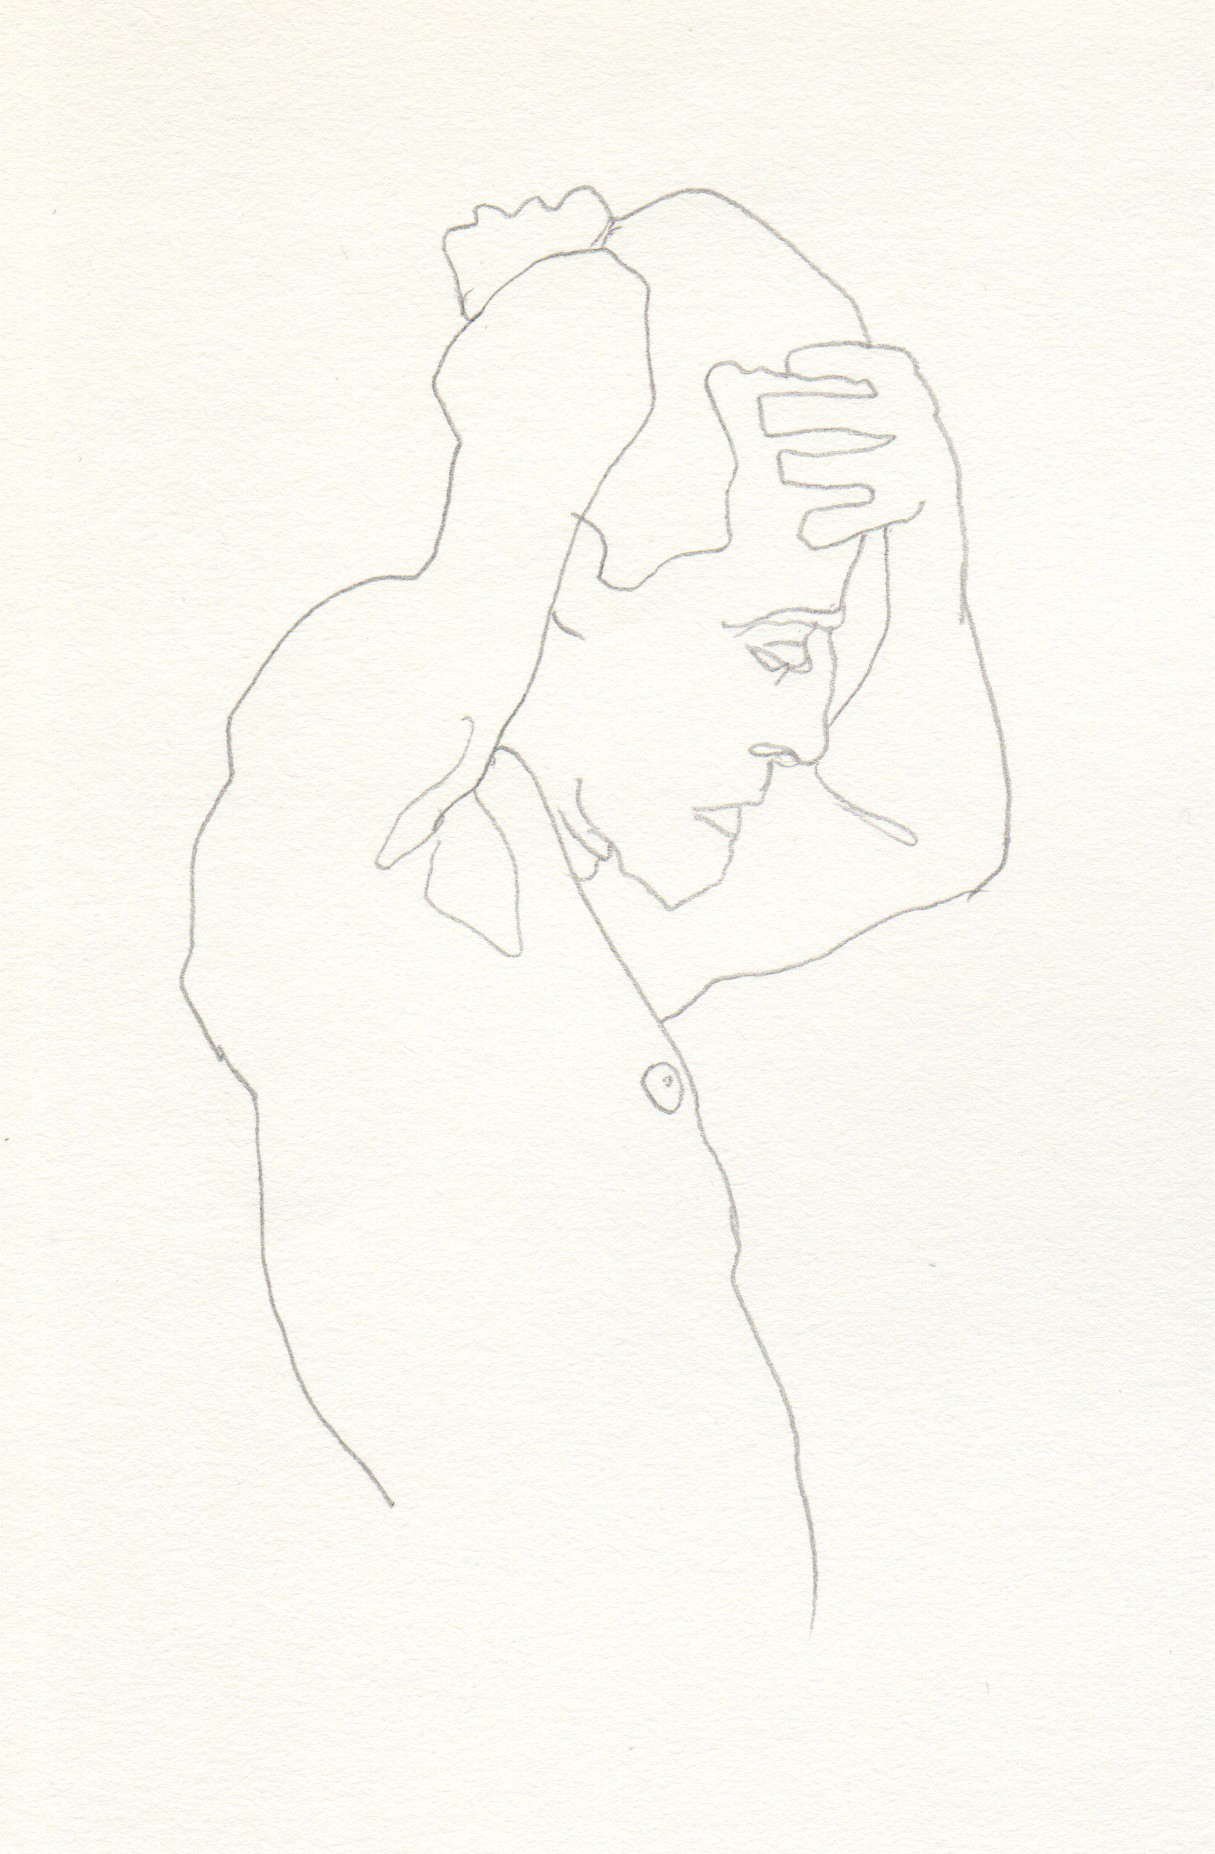 2012_Sketch_F-Beudin_034